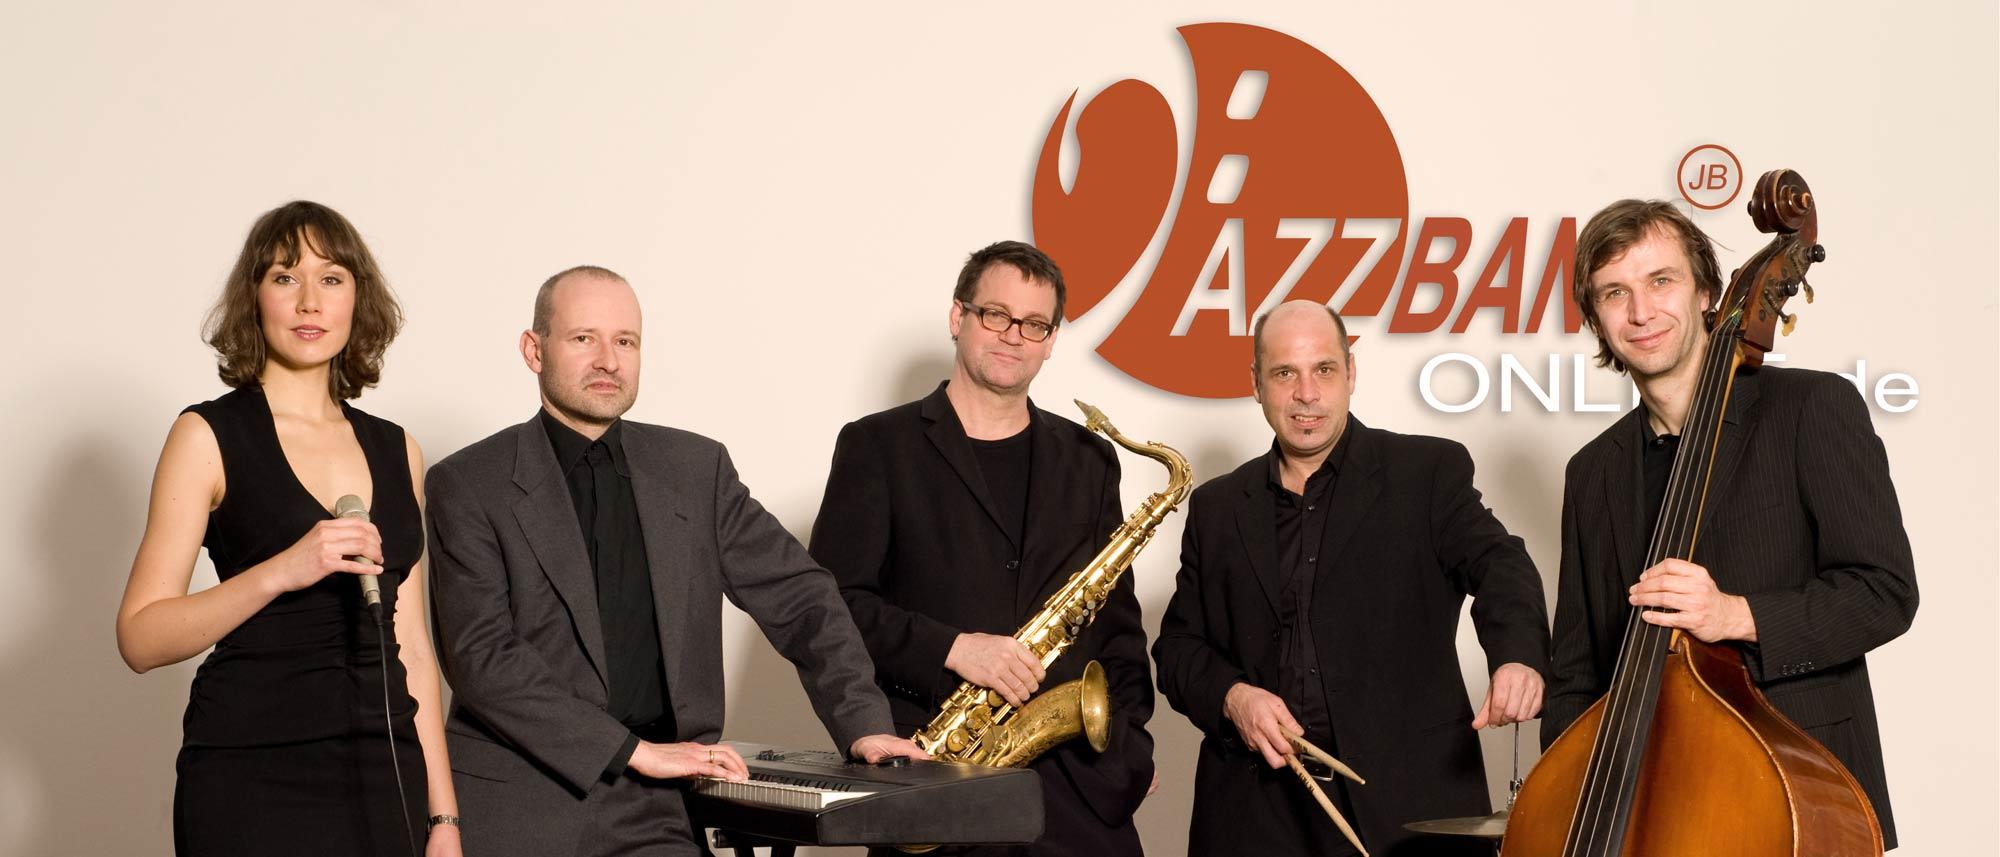 Jazzband-Gesang-Saxophon-Piano-Bass-Drums